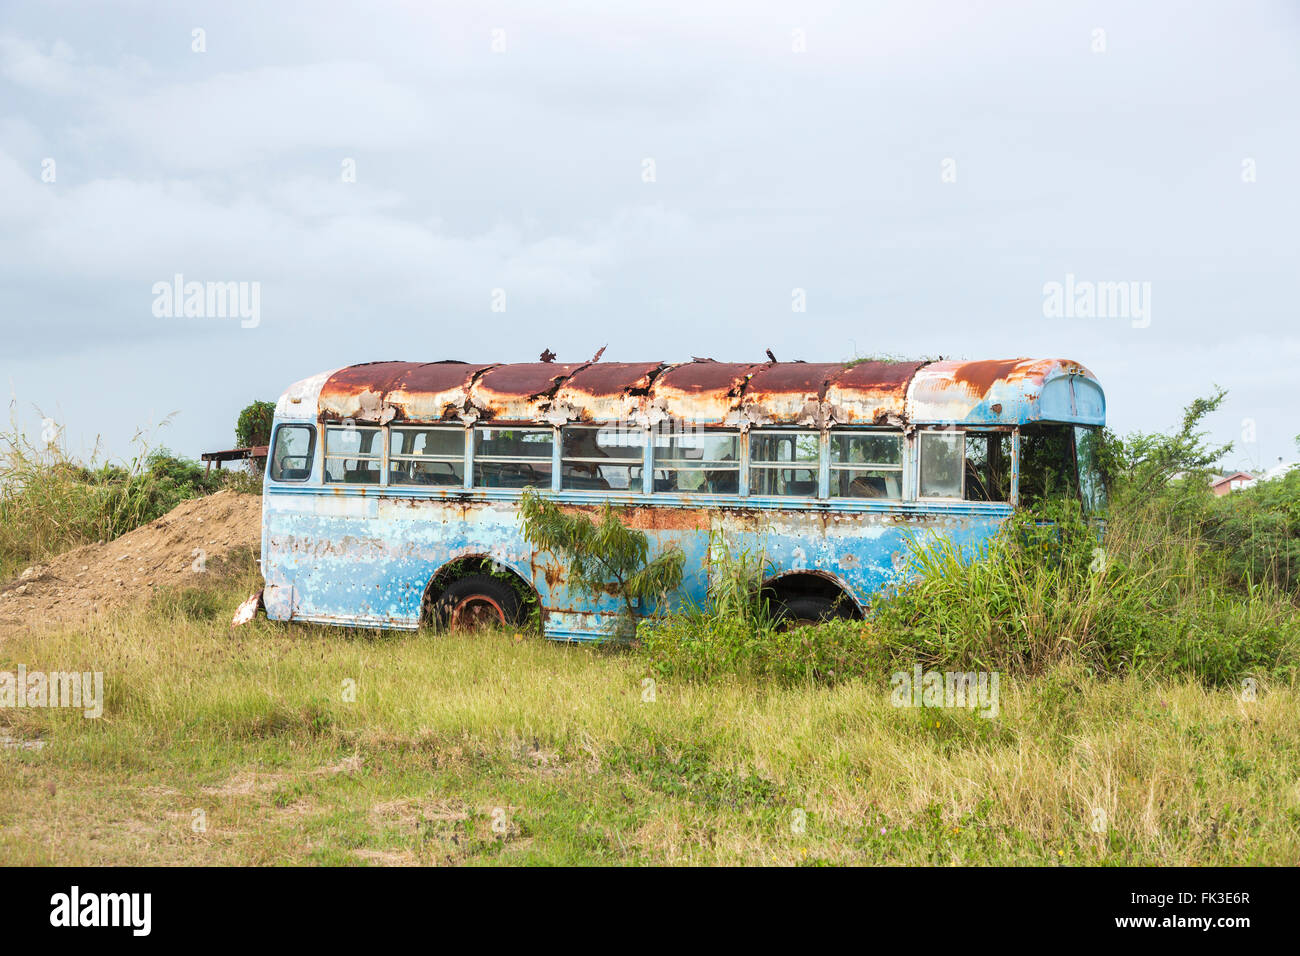 Decaying Blue Bird coach in Ogg Spencer's Trucking scrapyard, Liberta, south Antigua, Antigua and Barbuda, West - Stock Image